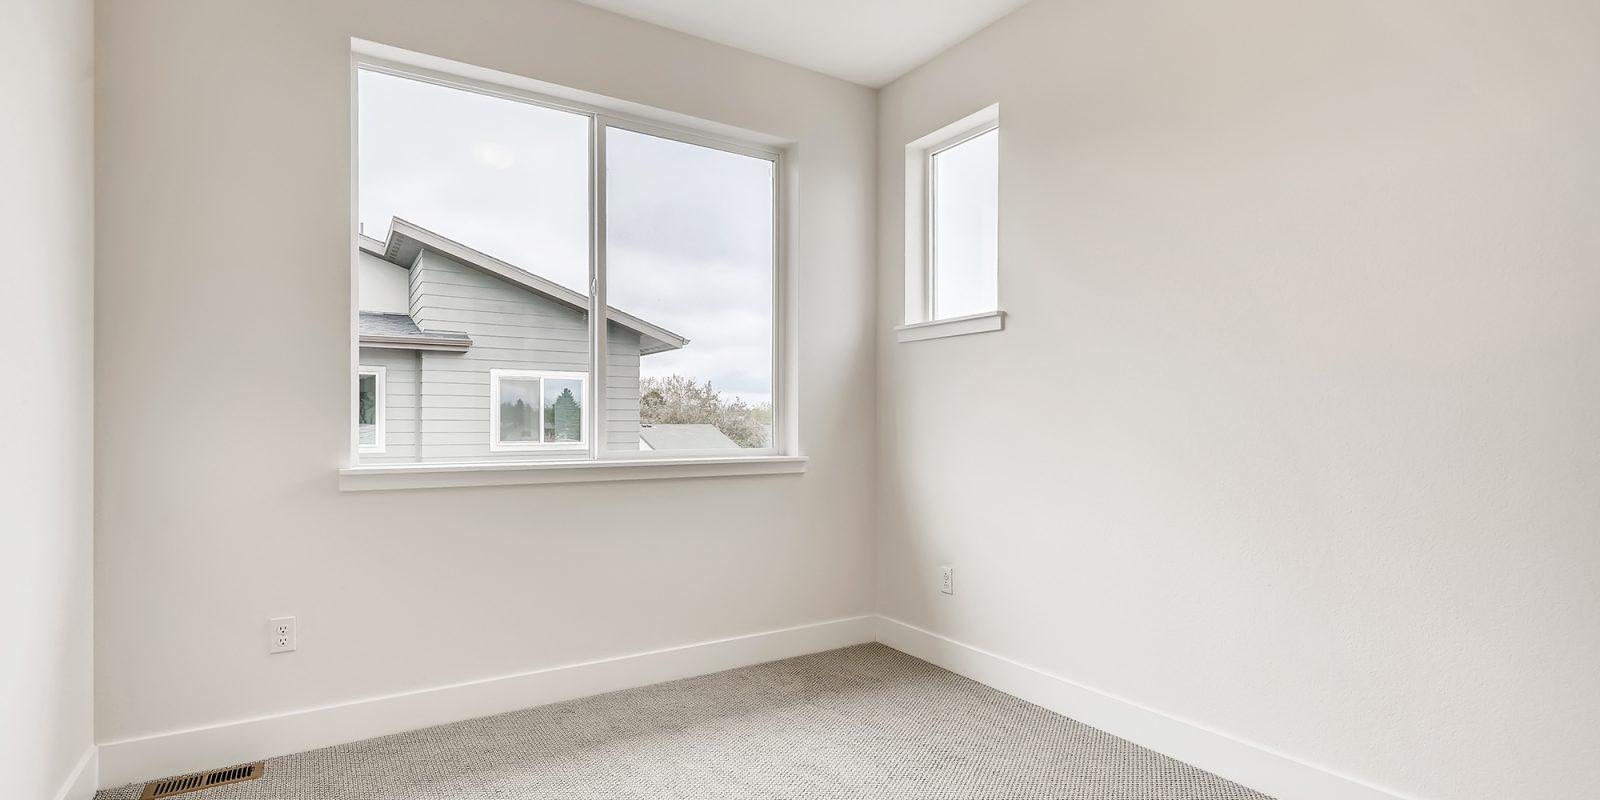 WestRidge DoMore Rows: Haven - Secondary Bedroom